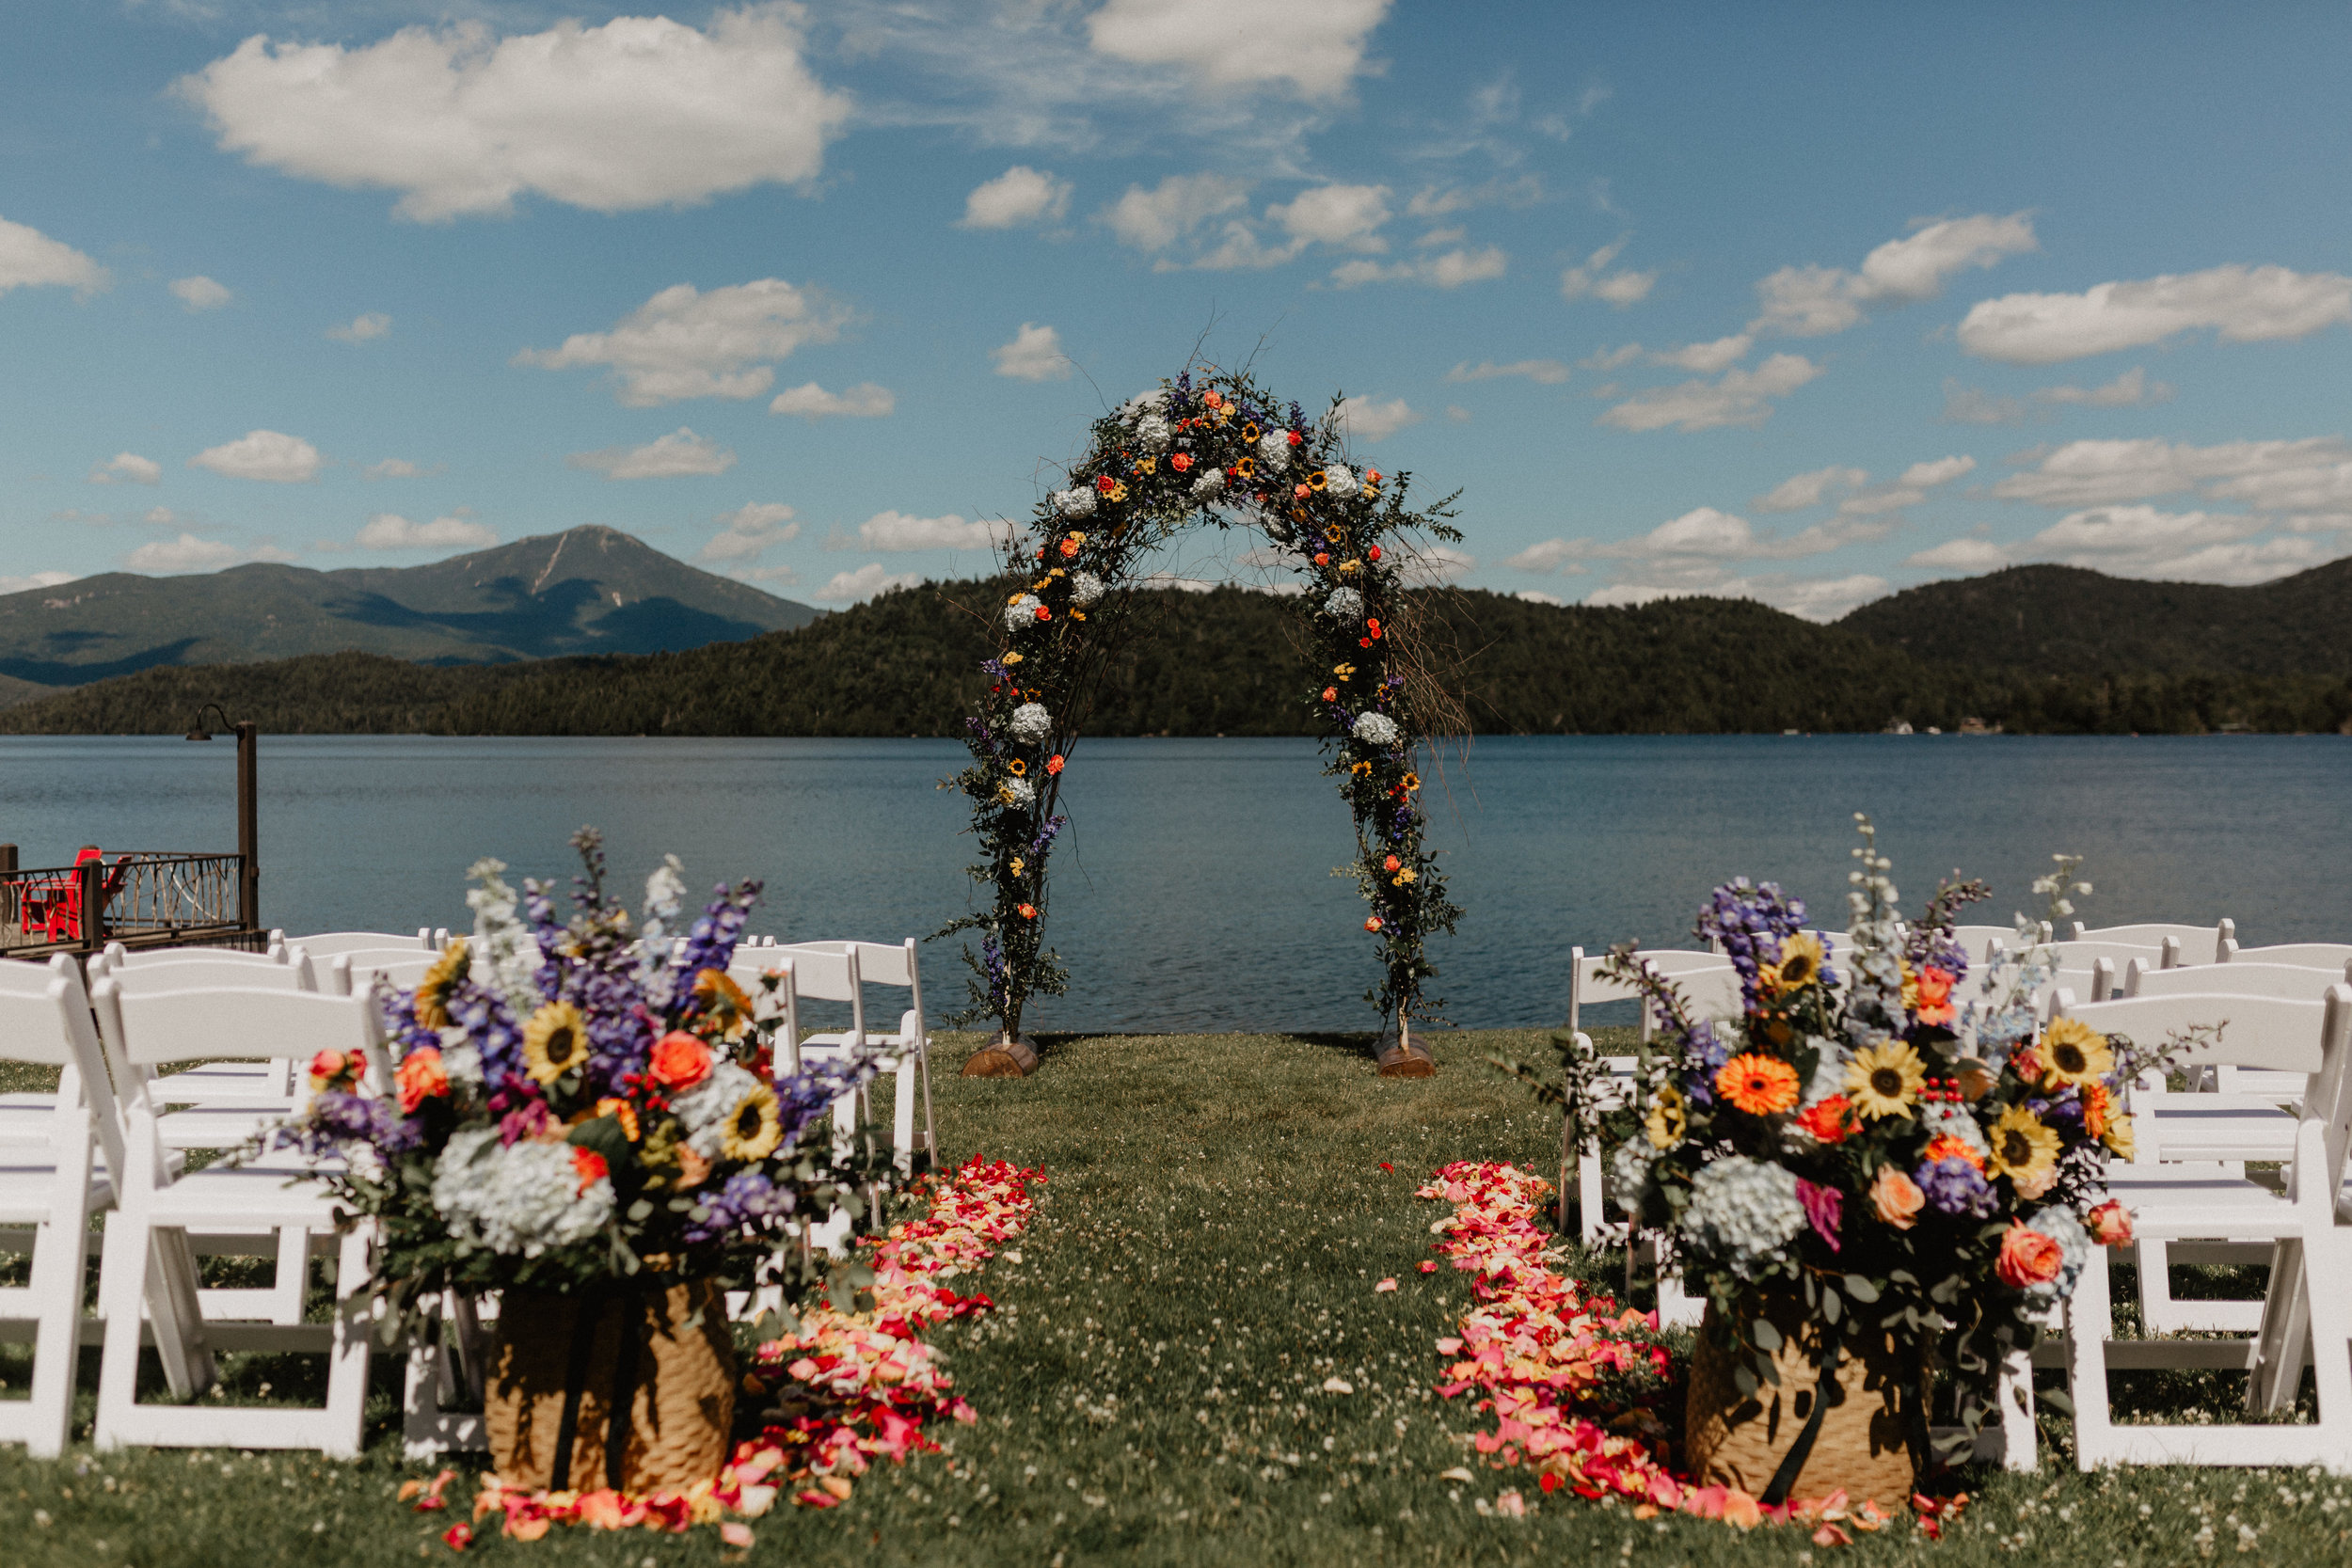 lake_placid_lodge_wedding_005.jpg